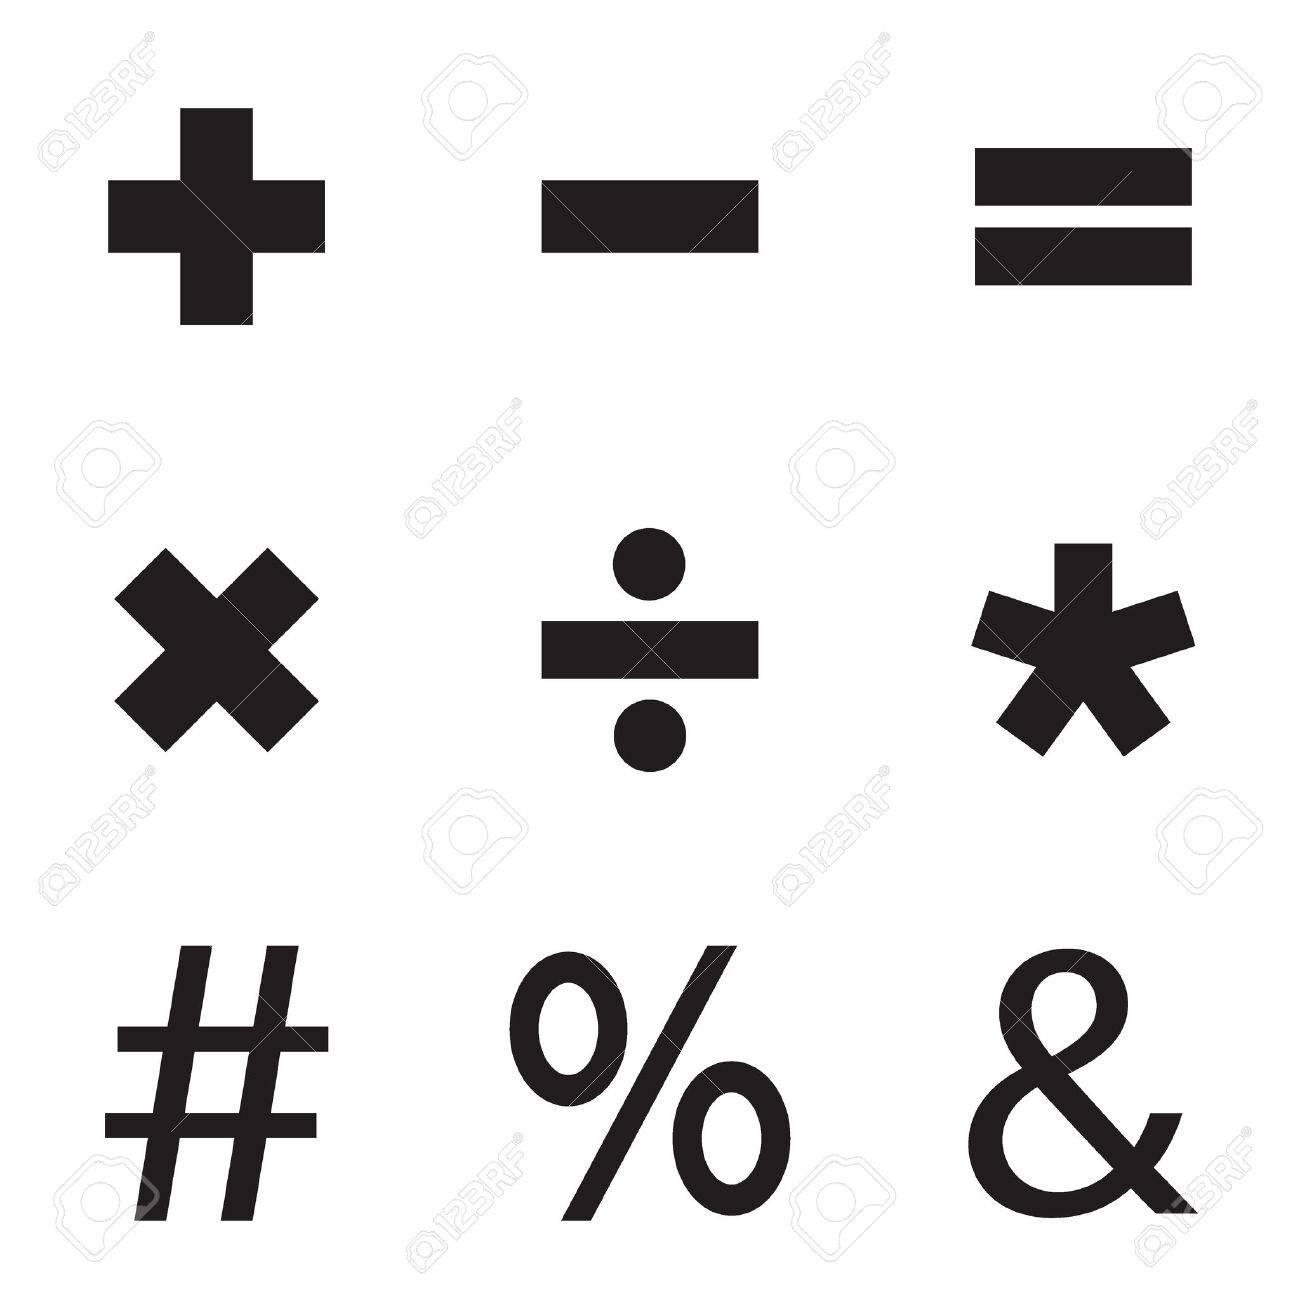 basic mathematical symbols. vector illustration. royalty free